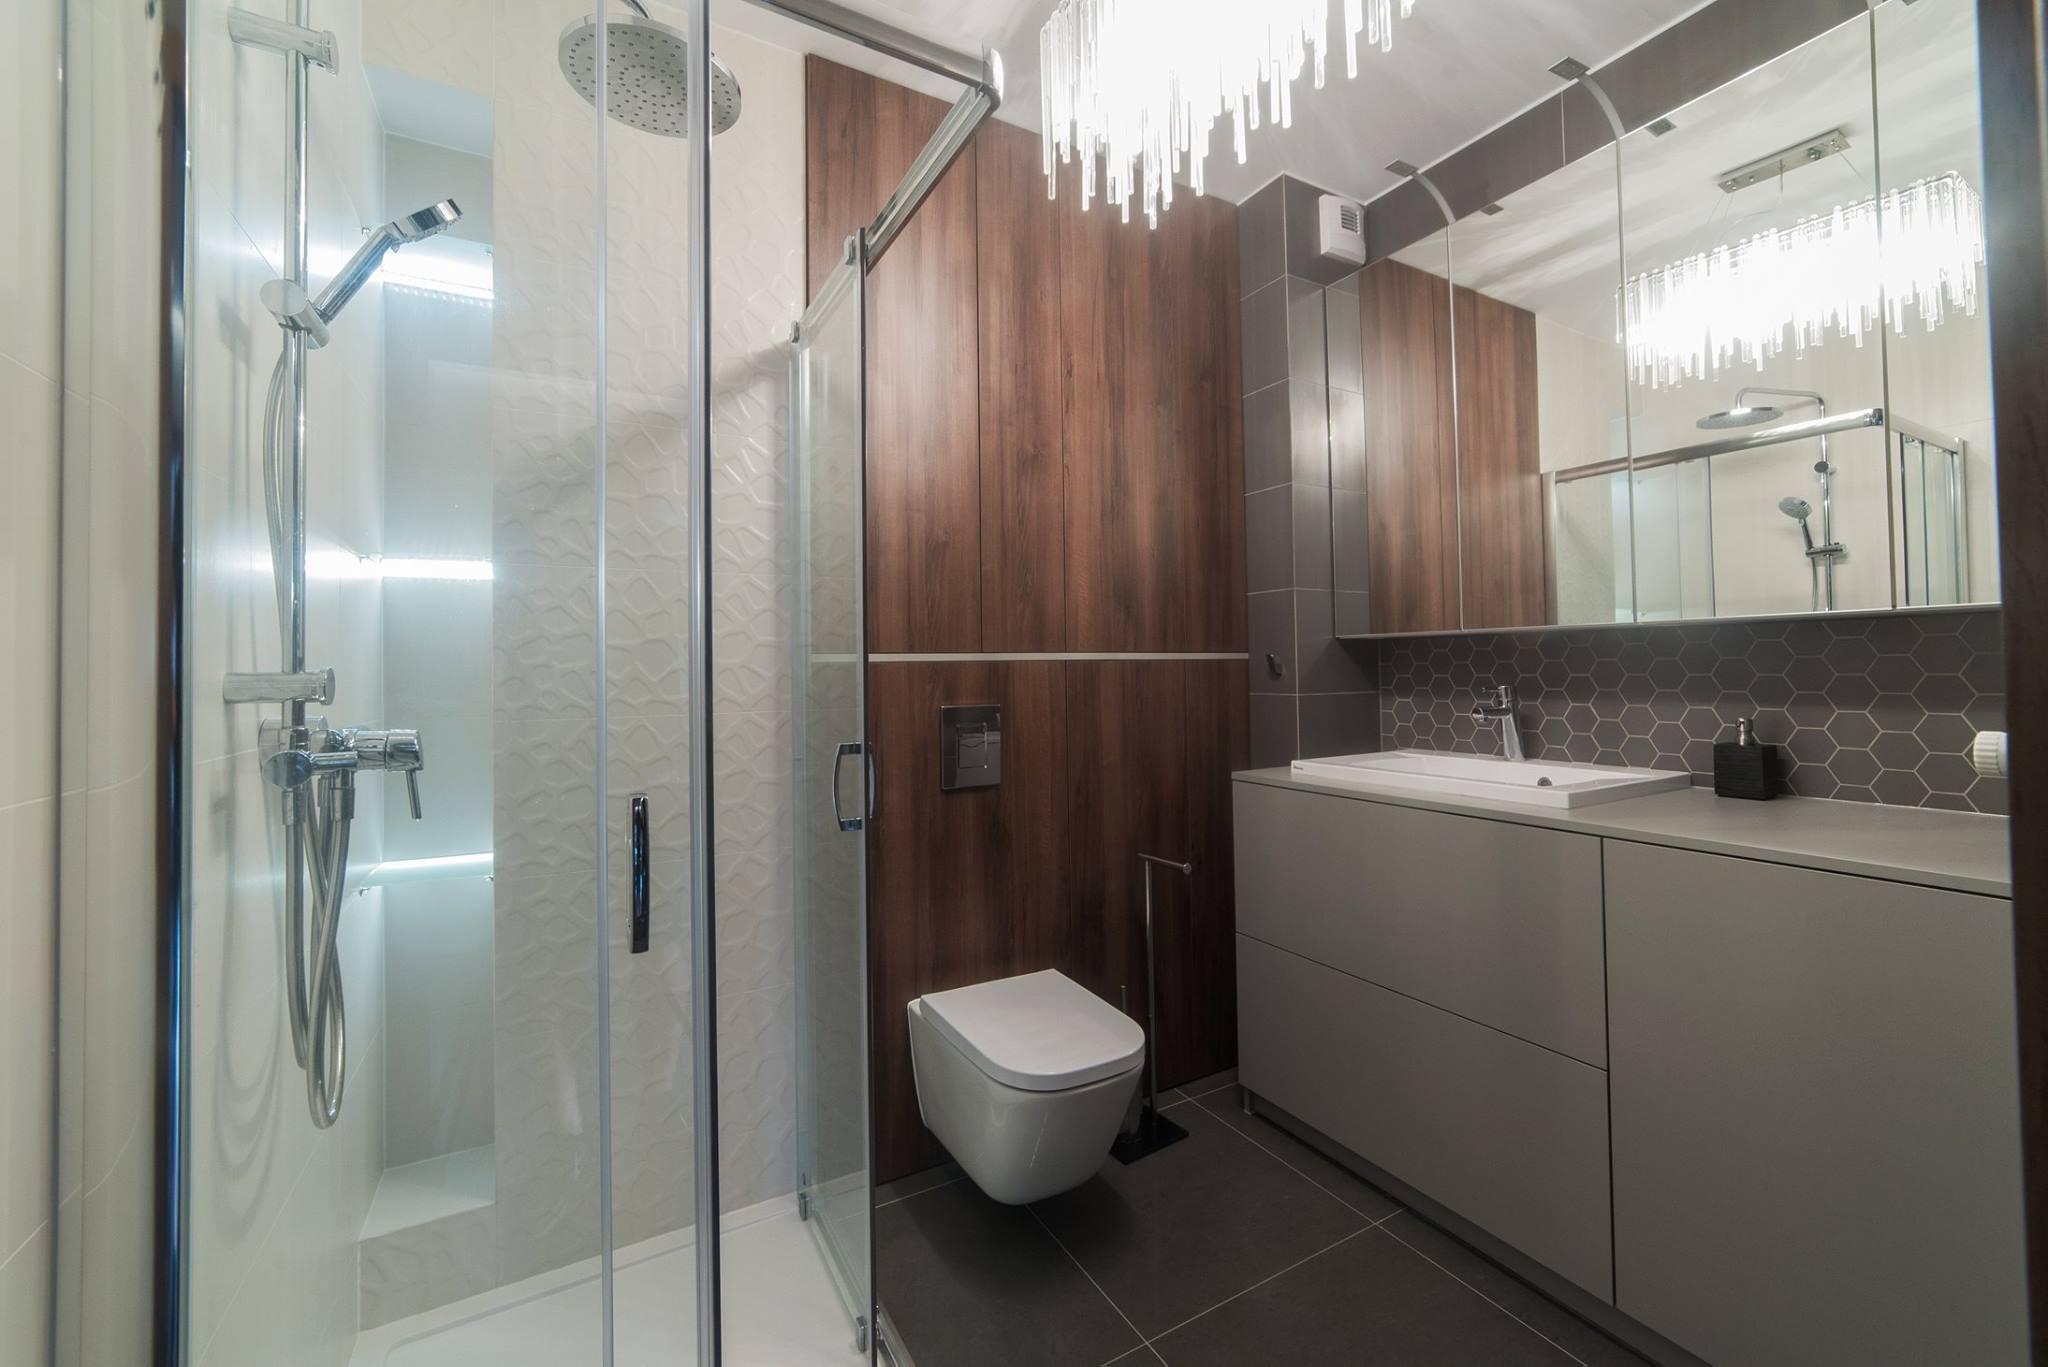 łazienka elegancka.jpg